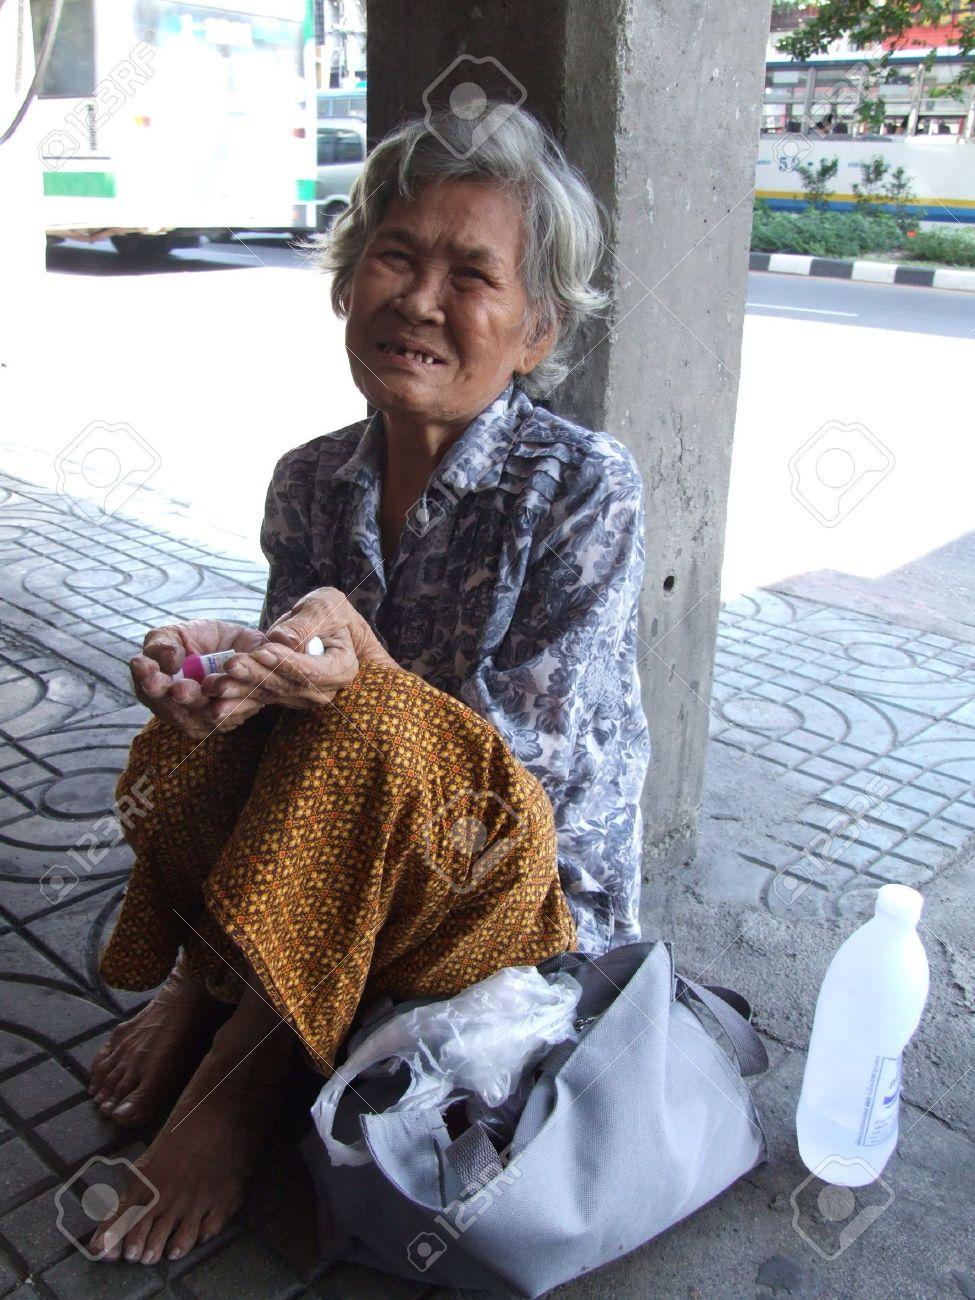 BANGKOK, THAILAND - SEPTEMBER 23 : Old lady begs for money on the side of the road in central Bangkok September 23, 2007 in Bangkok.  Stock Photo - 7492387